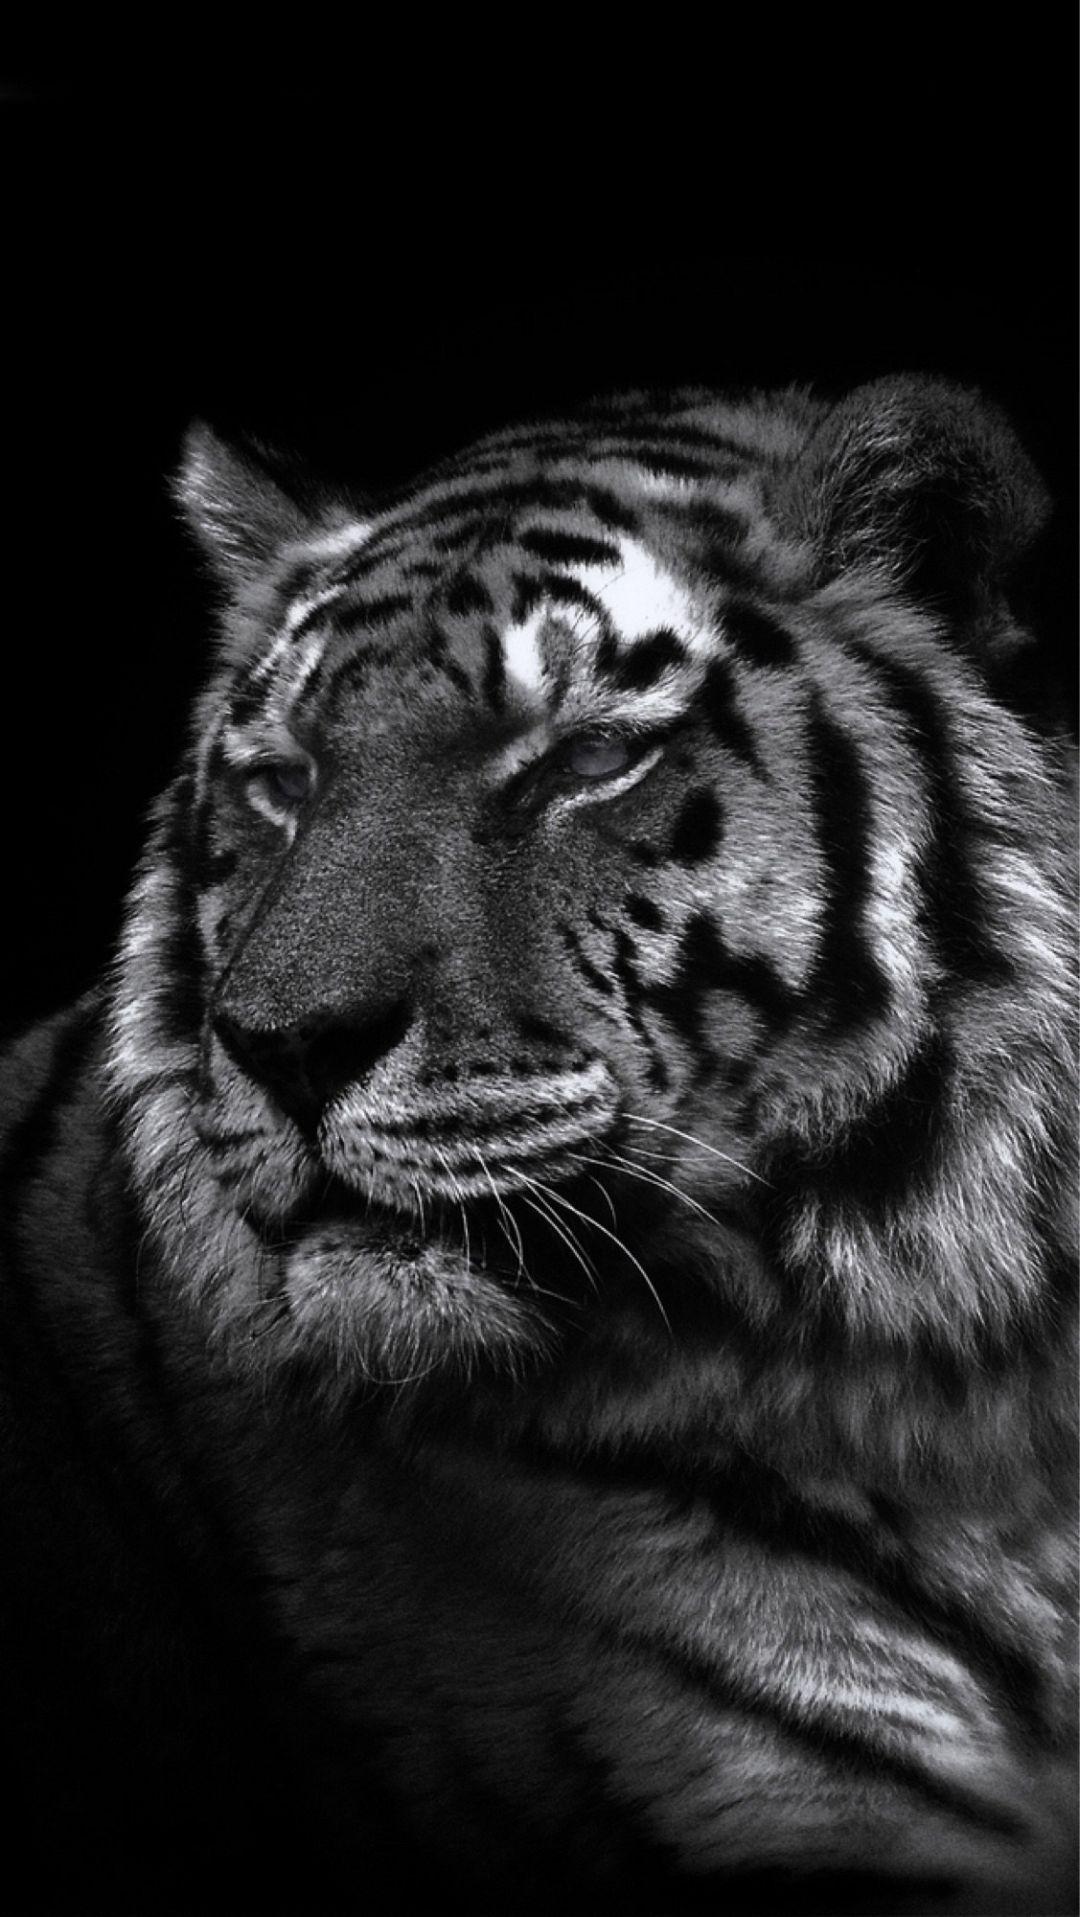 Black Tiger Wallpaper Iphone 1080x1917 Wallpaper Teahub Io